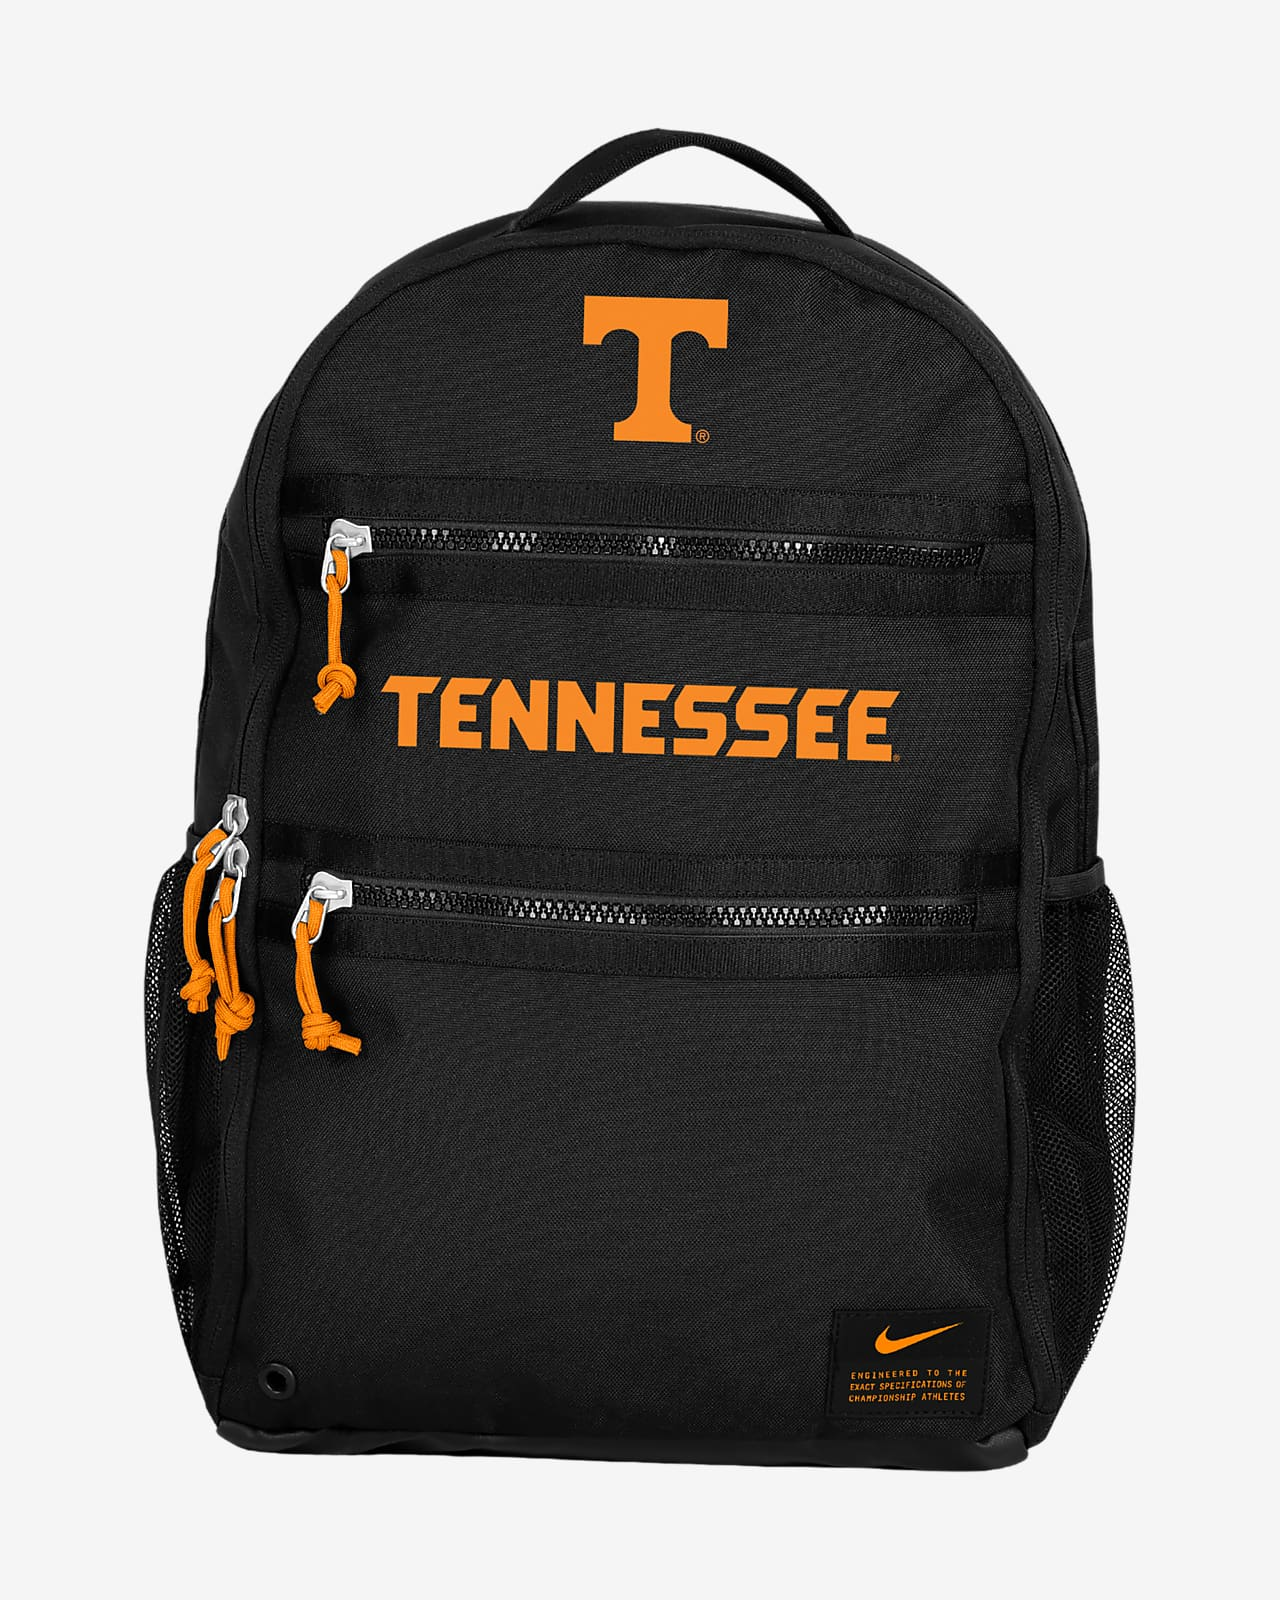 Nike College (Tennessee) Backpack